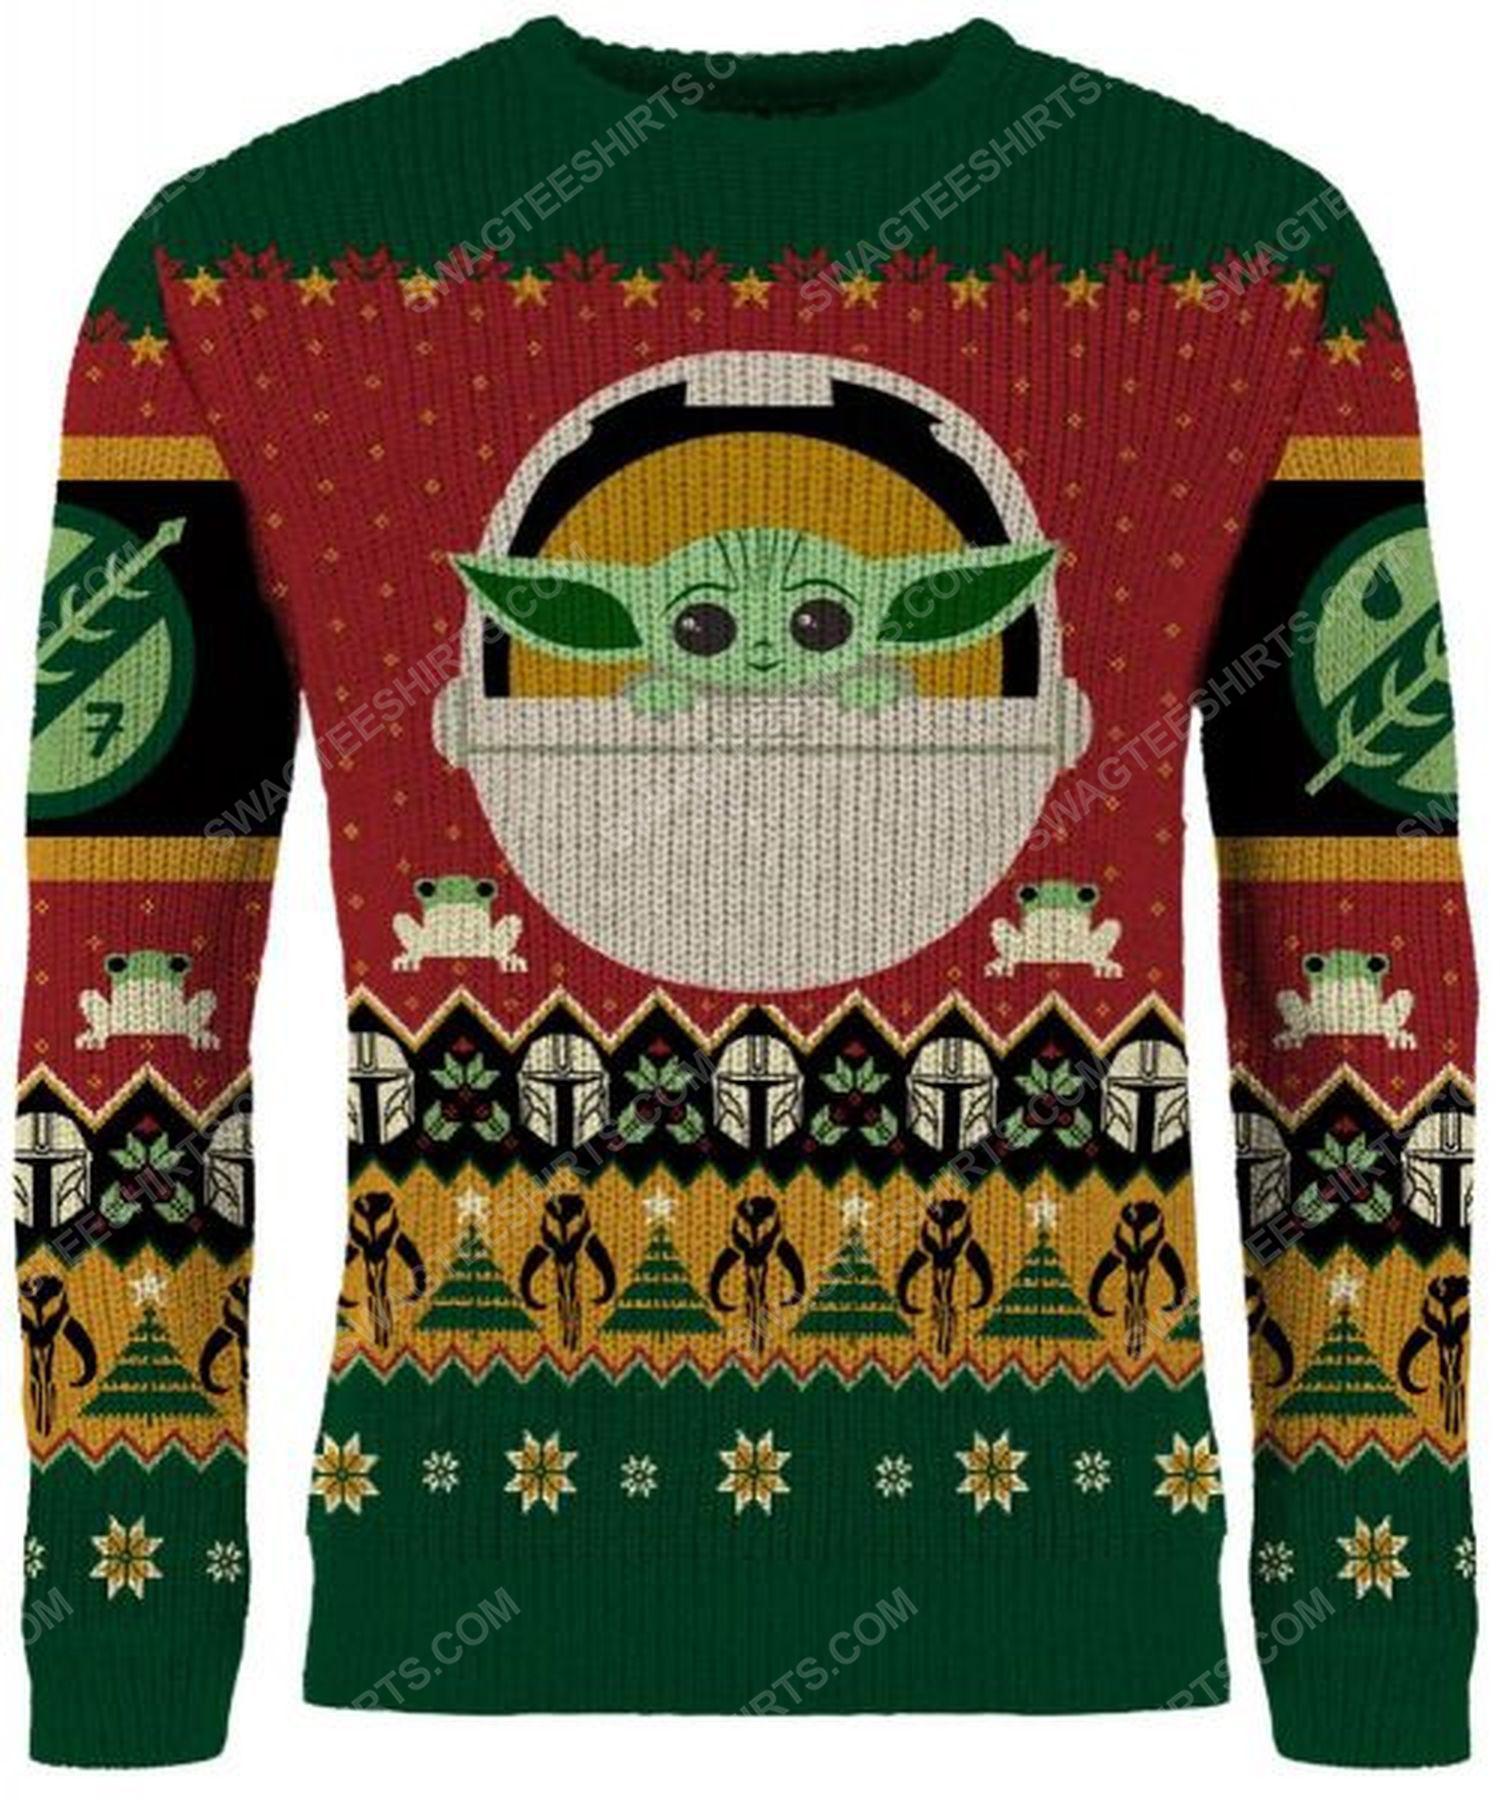 Star wars the mandalorian full print ugly christmas sweater 2 - Copy